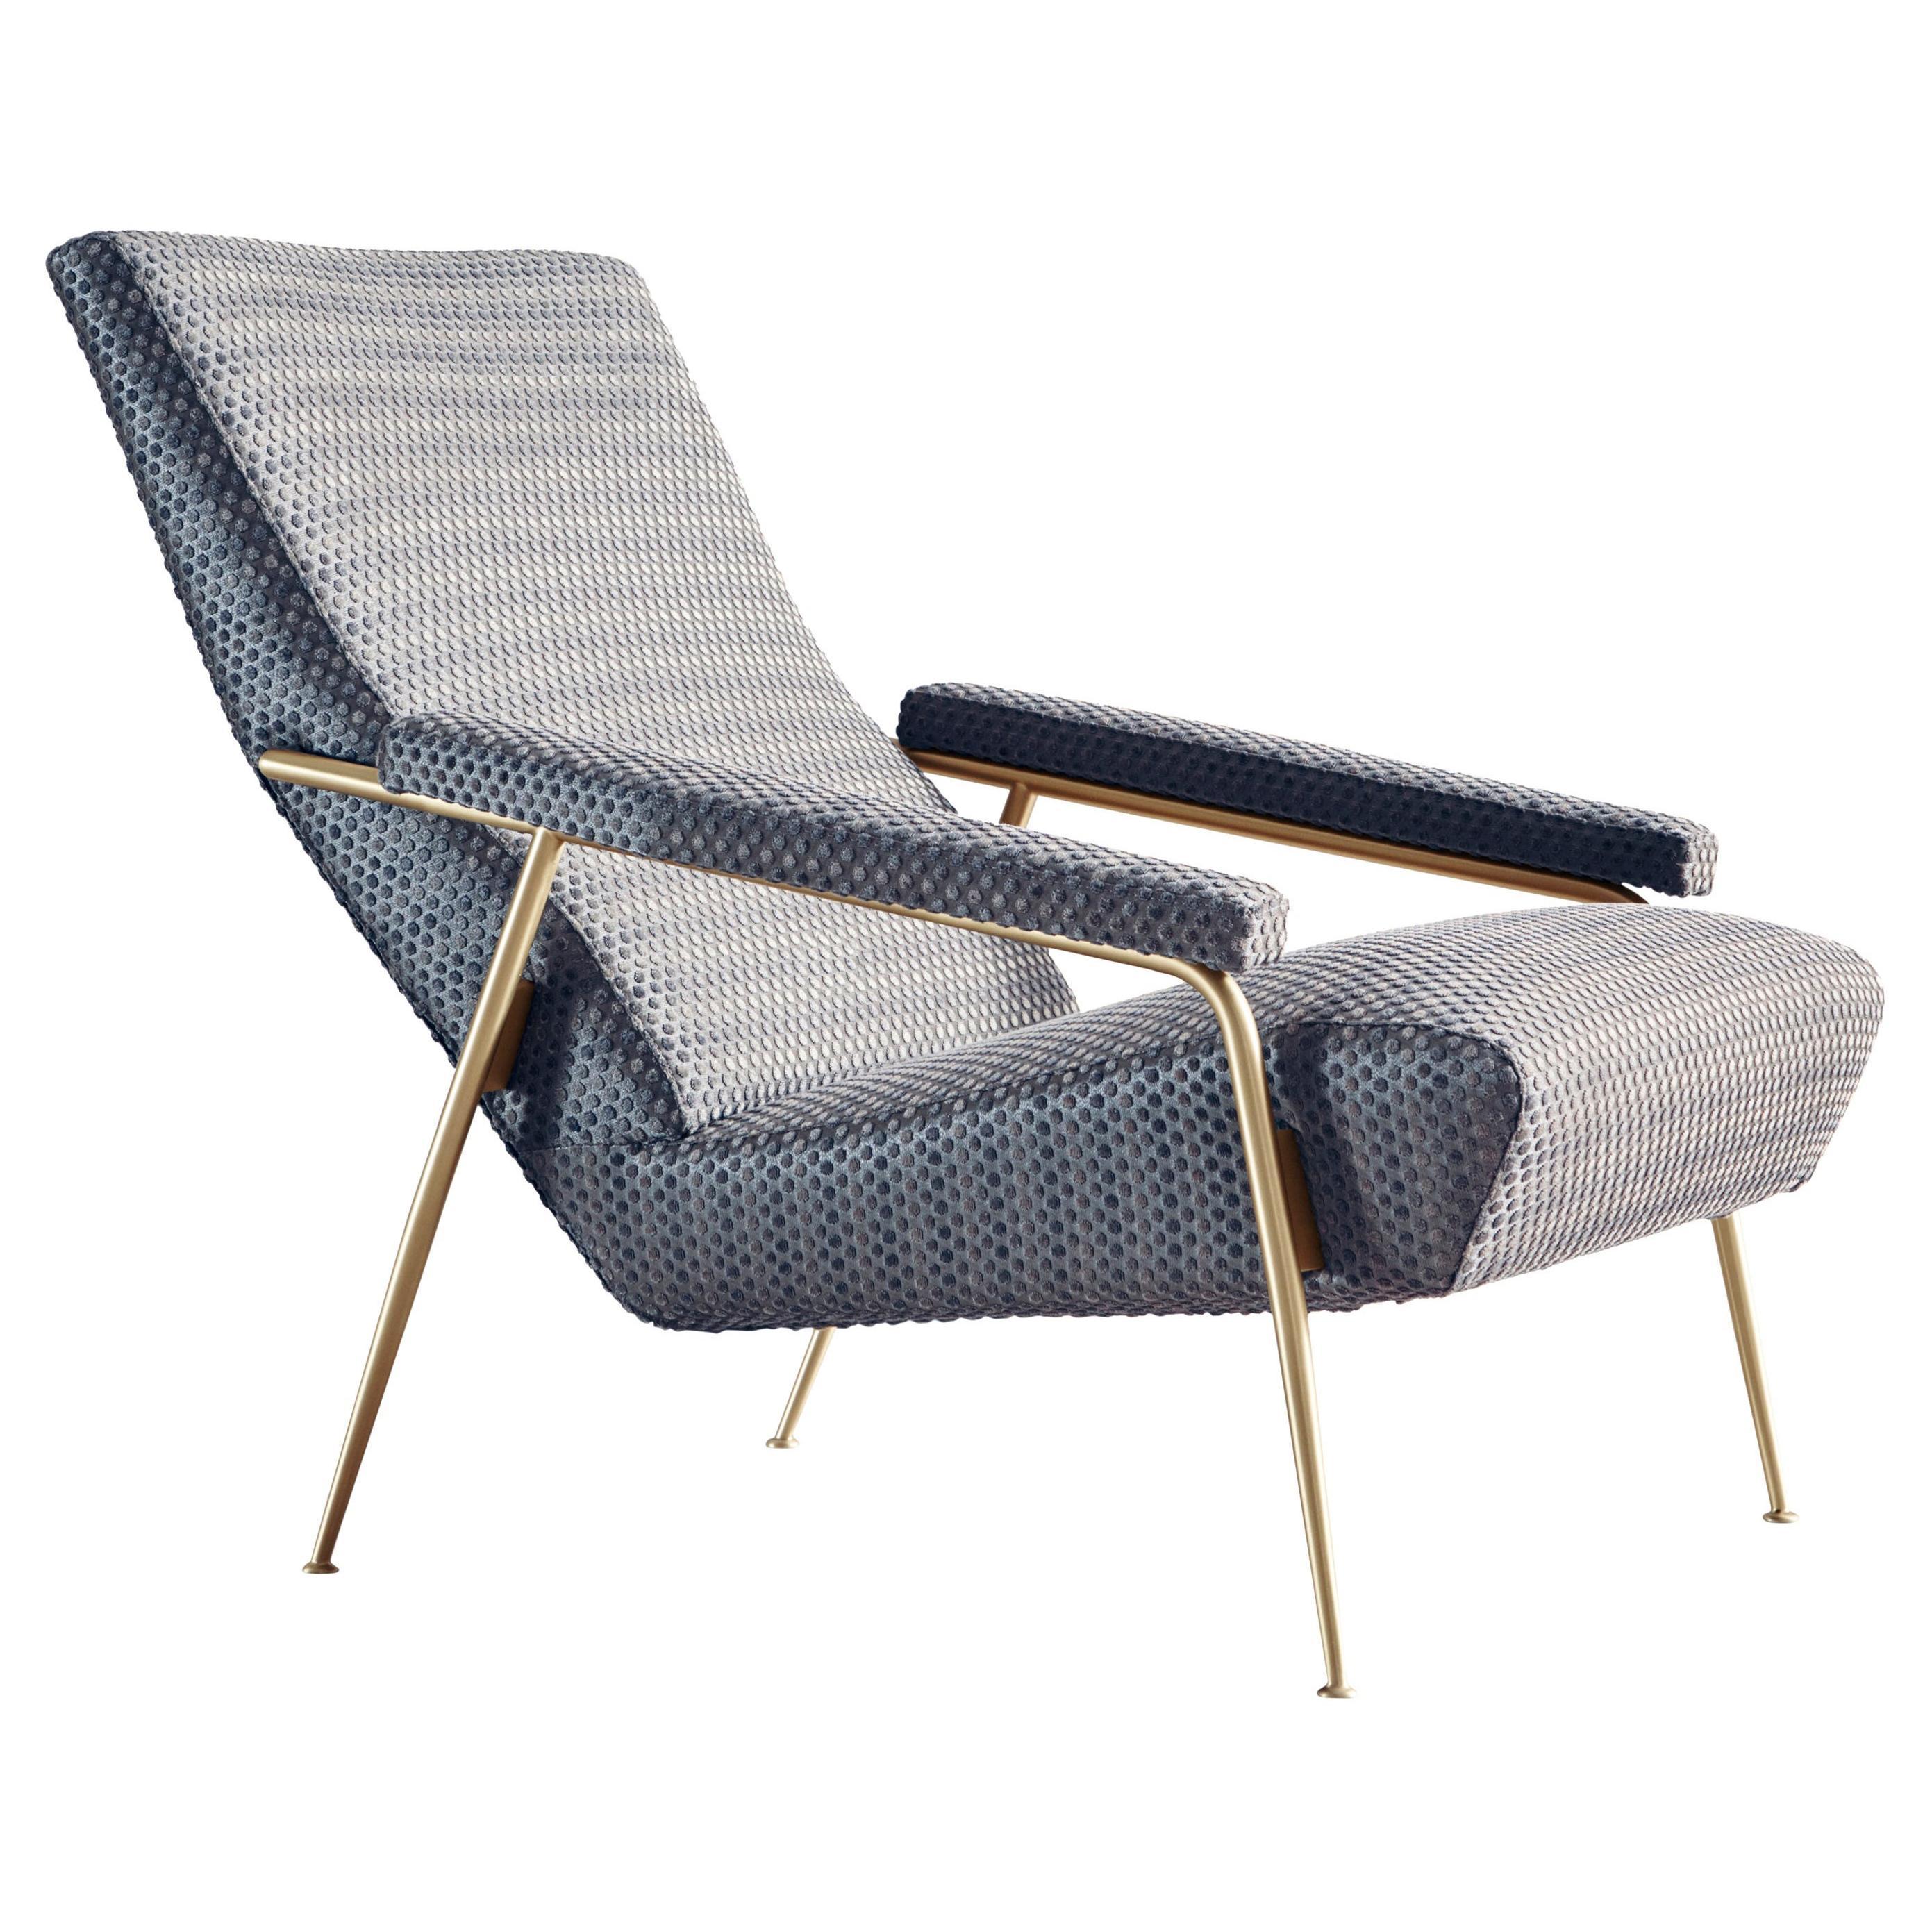 Molteni&C D.153.1 Armchair in Blue Punteggiato Velvet by Gio Ponti